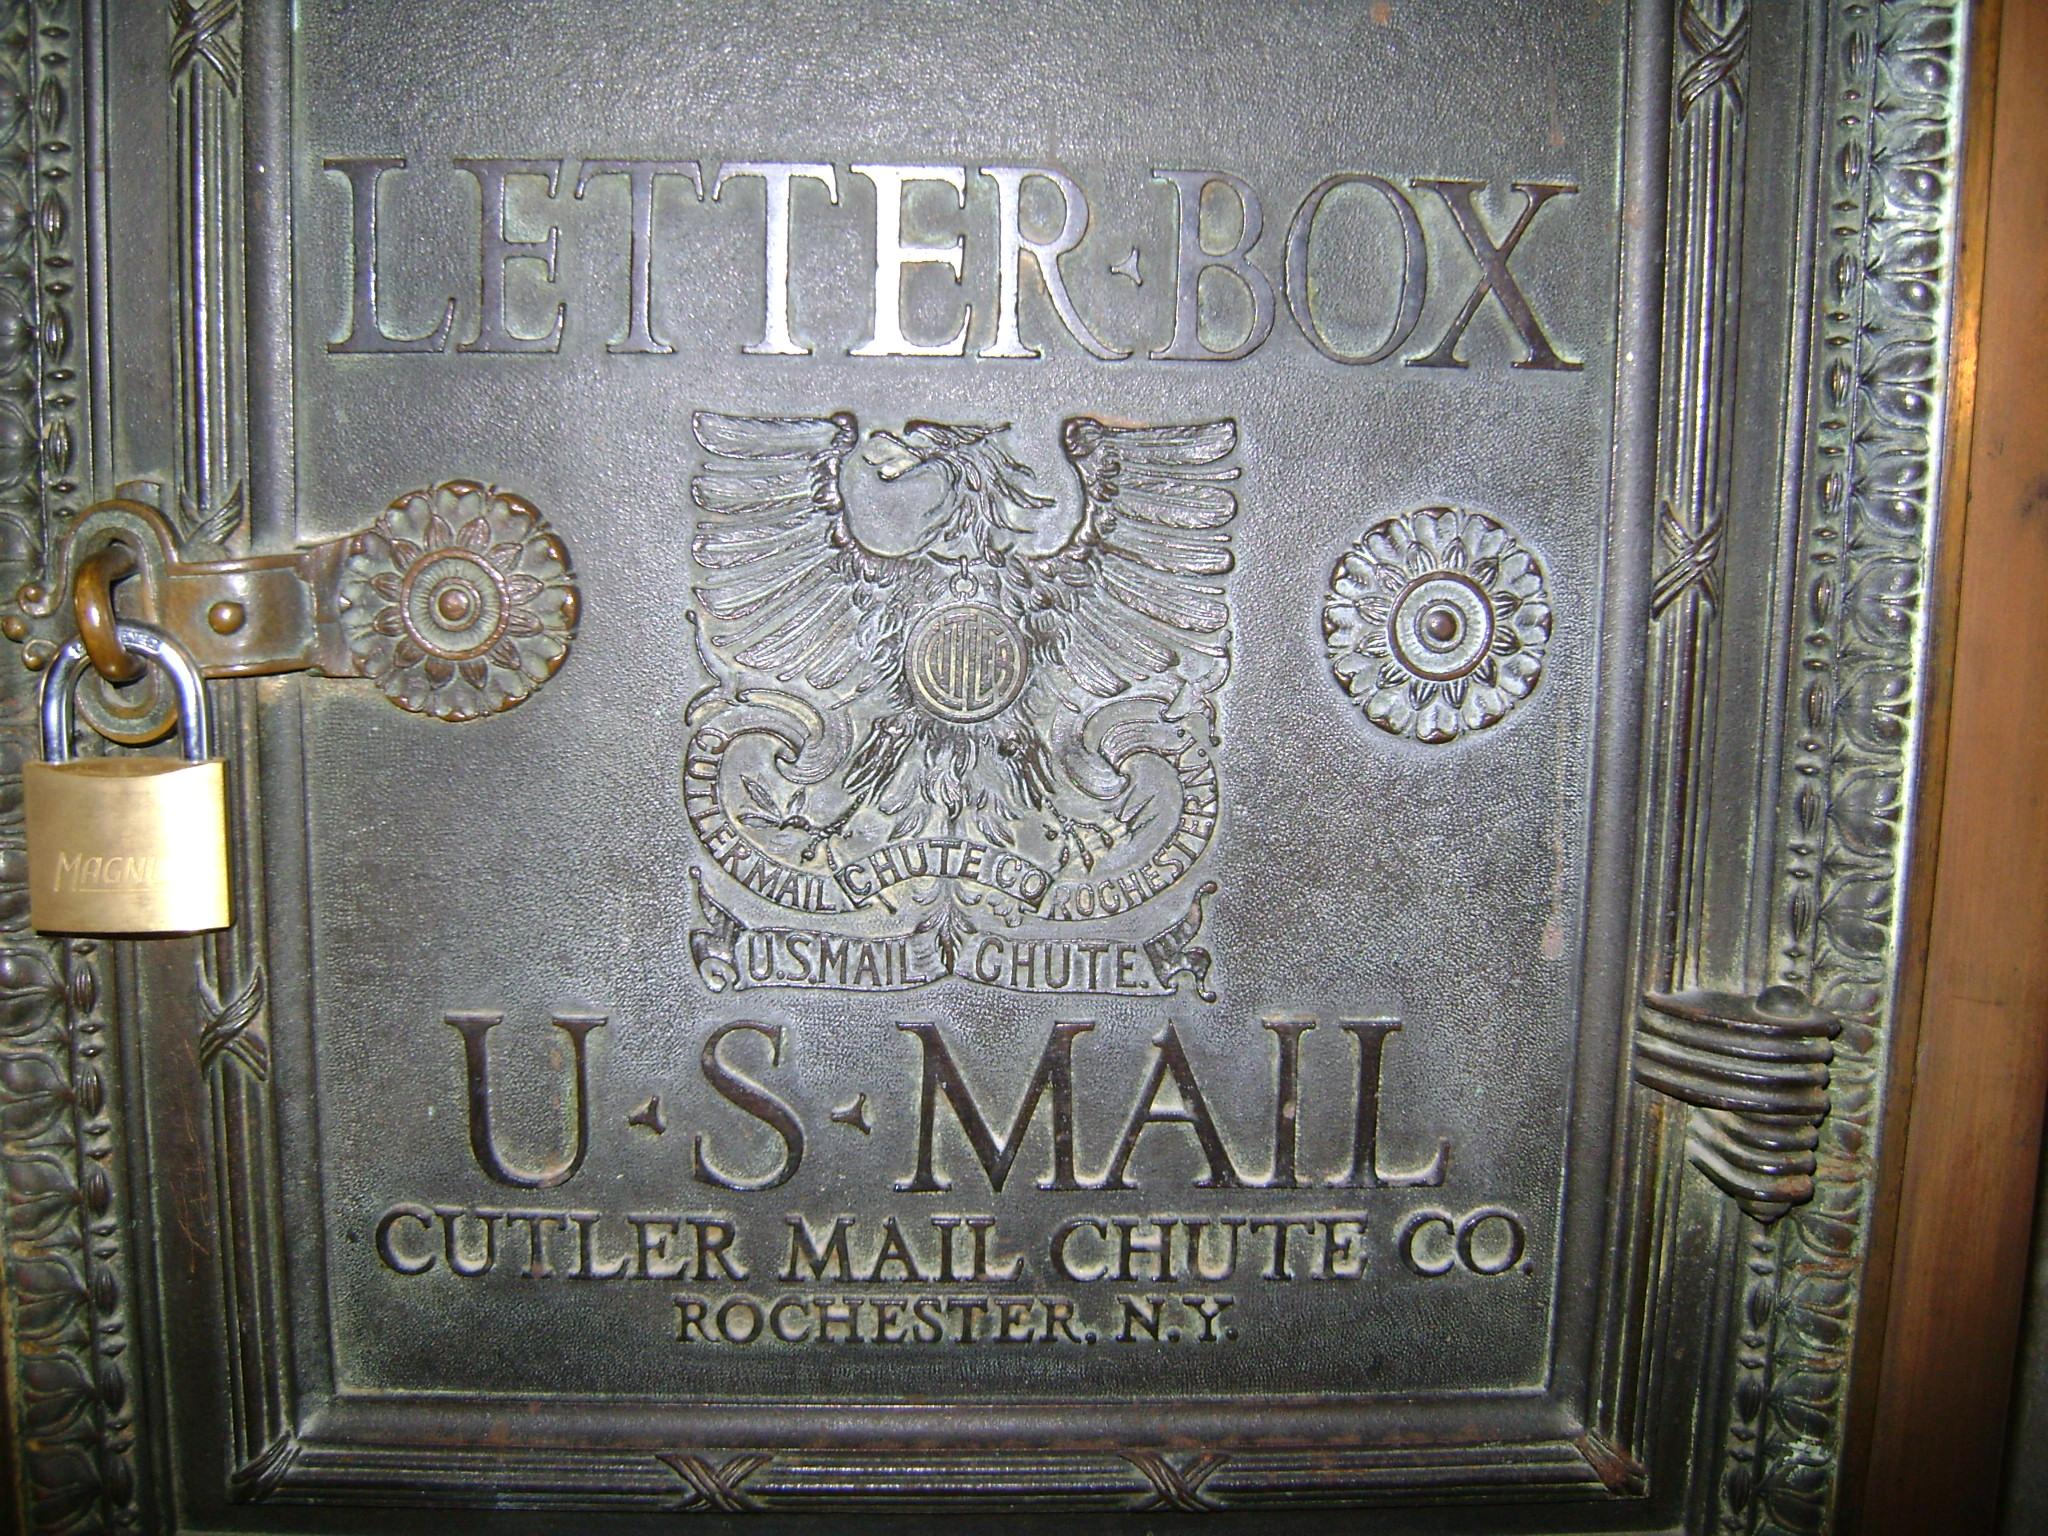 File:Cutler mail chute letter box JPG - Wikimedia Commons